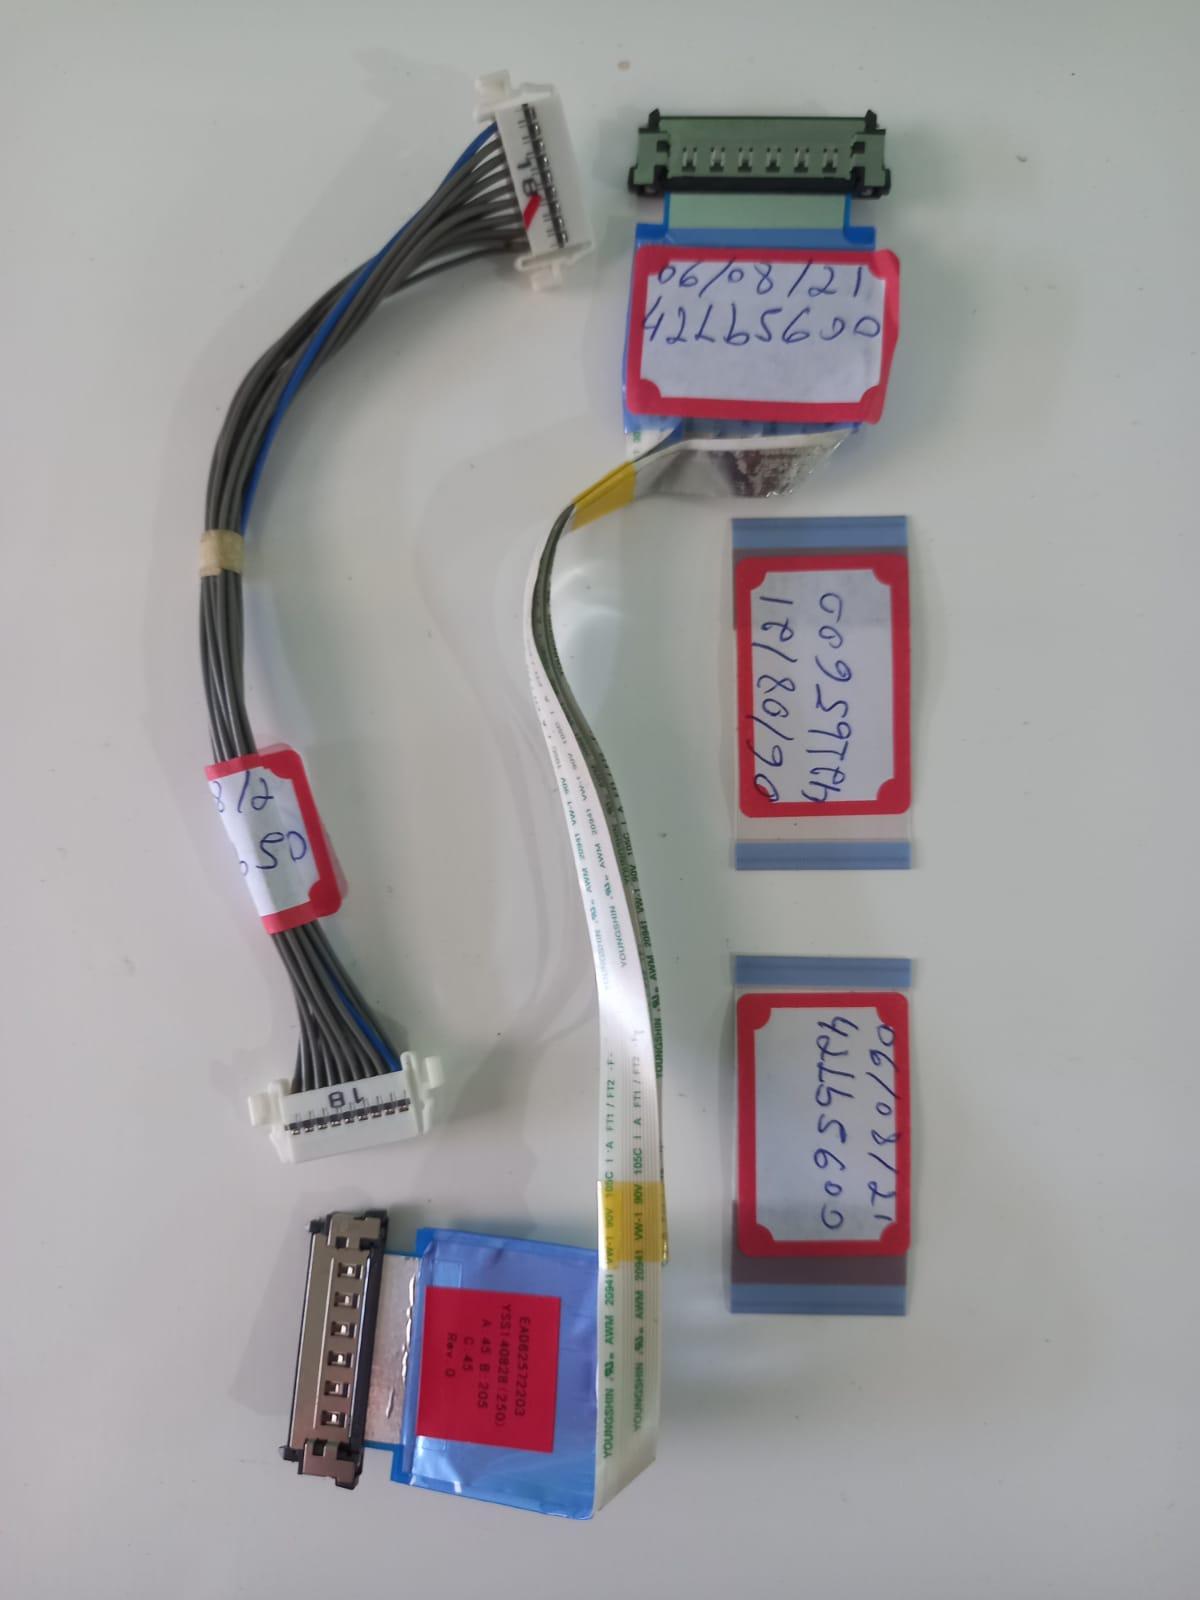 Kit cabo flat para TV LG 42LB5600